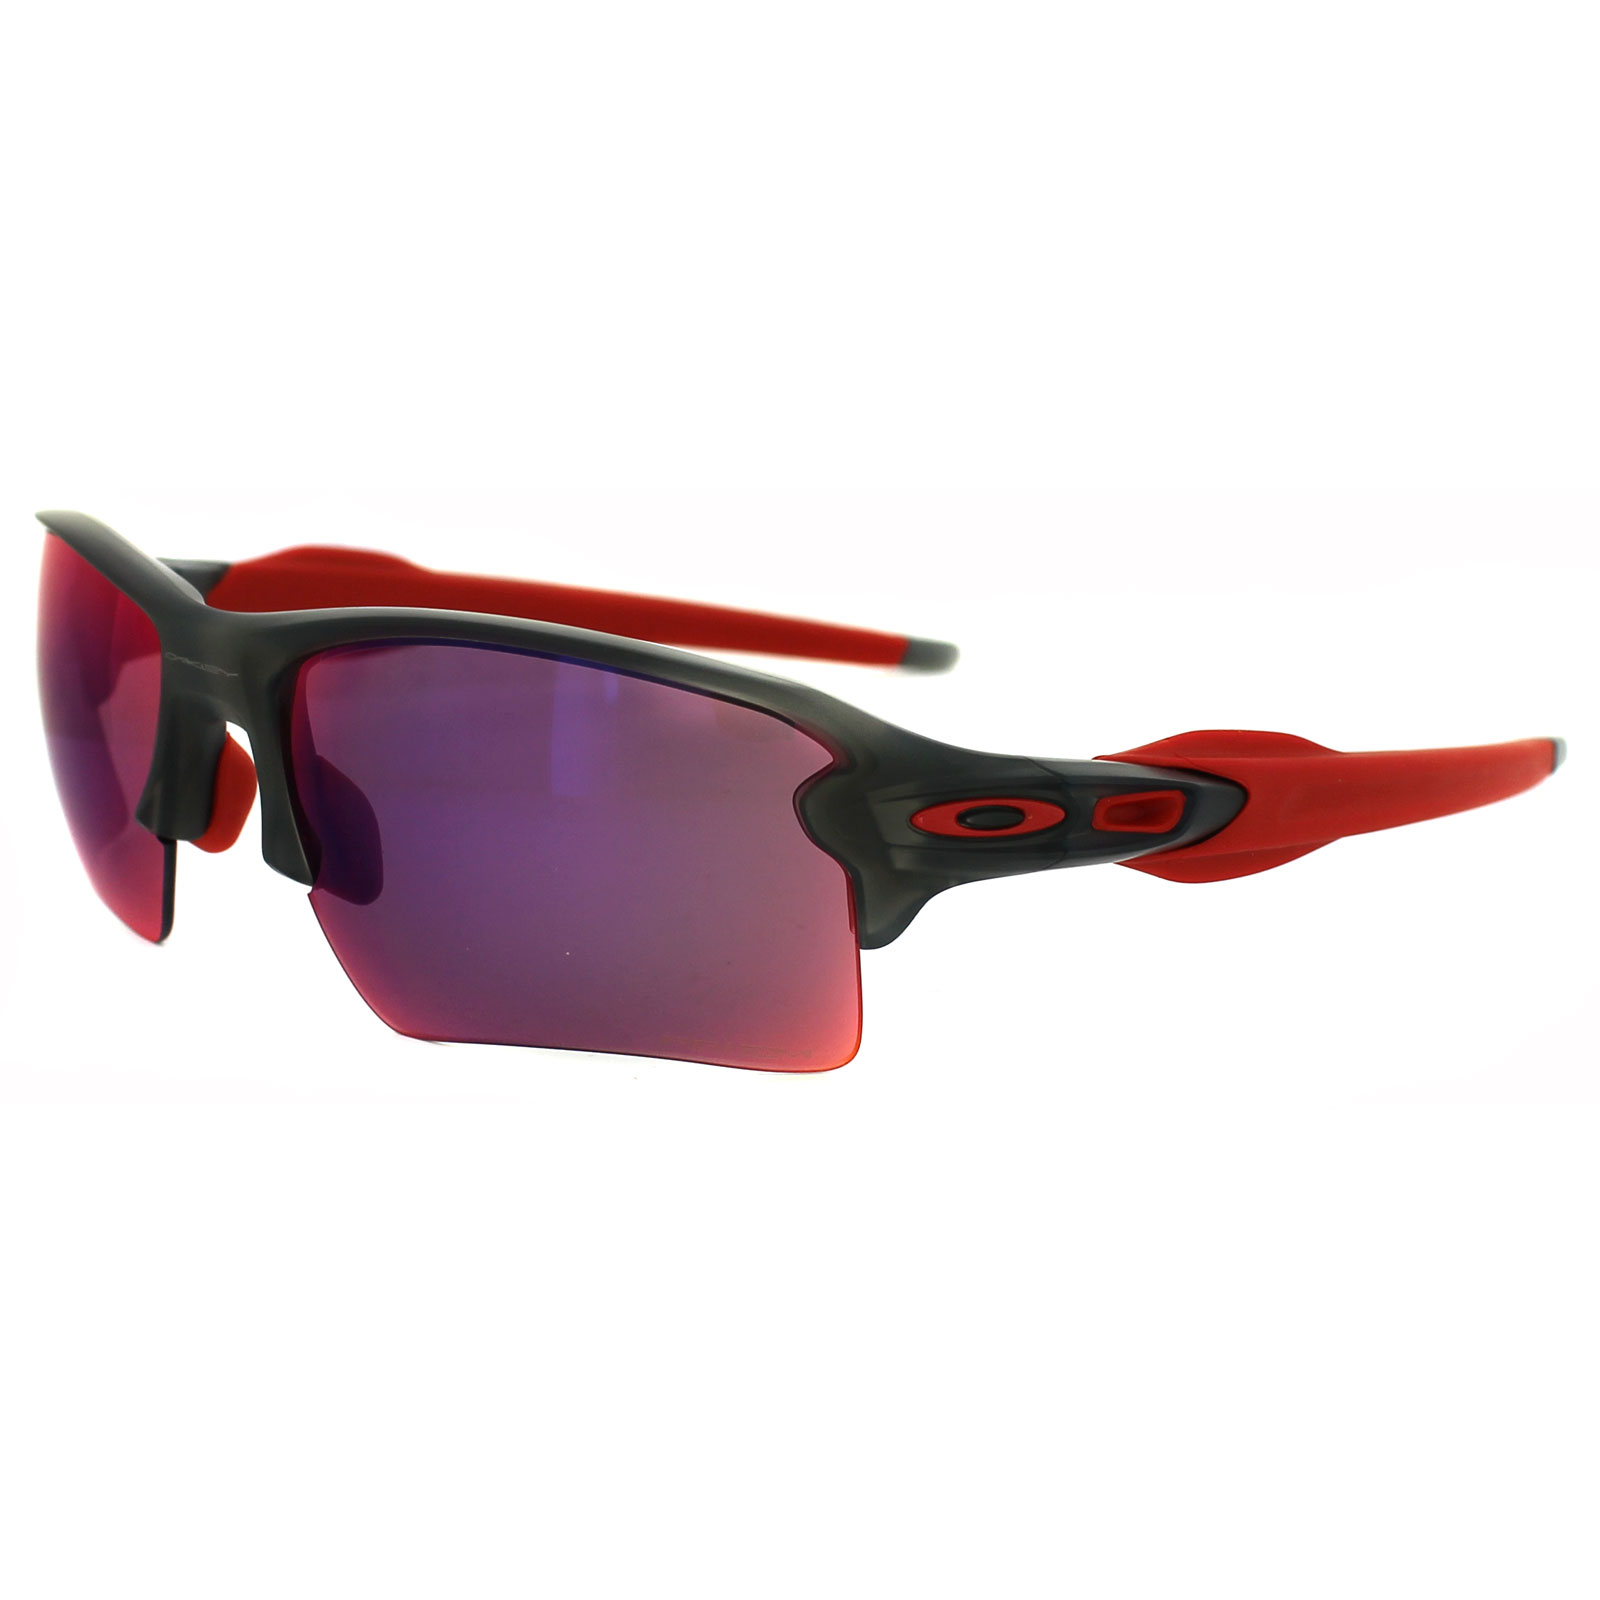 a481ebdb01d Purple Oakley Sunglasses Flak 2.0 « Heritage Malta